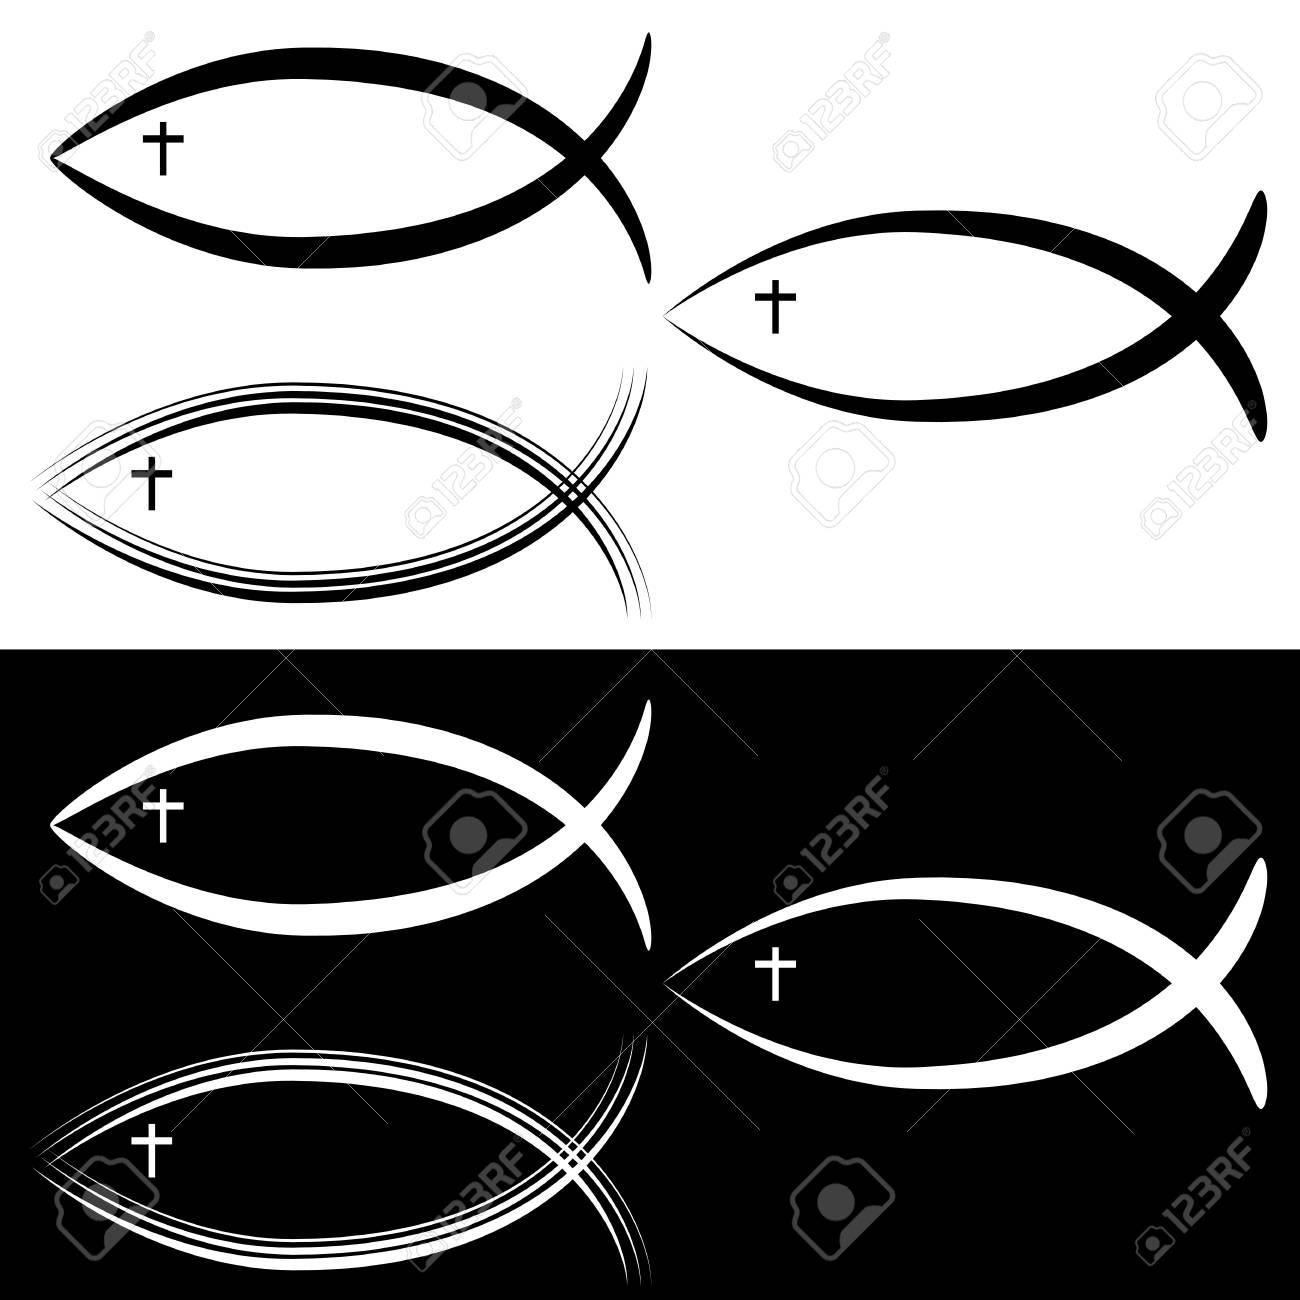 An Image Of A Christian Jesus Fish Symbol Set Black White Royalty